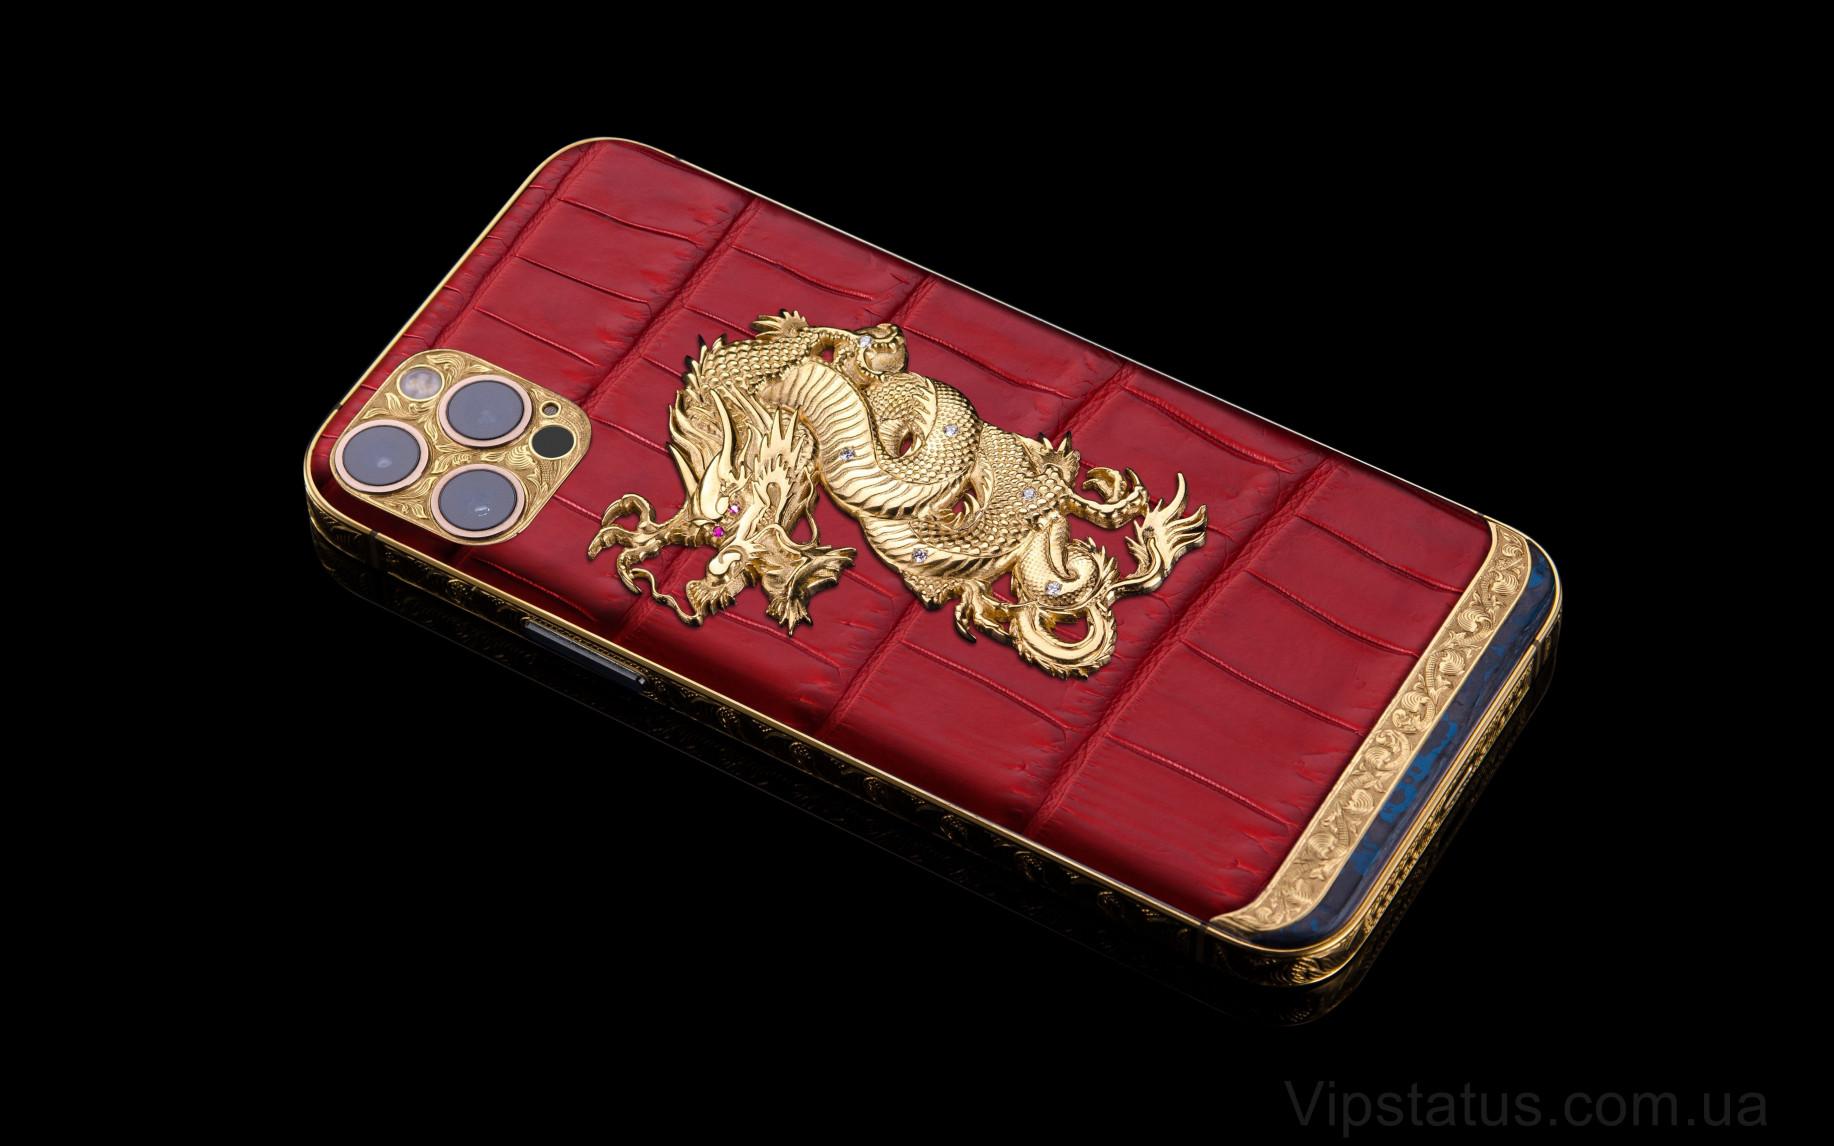 Elite Oriental Dragon IPHONE 12 PRO MAX 512 GB Oriental Dragon IPHONE 12 PRO MAX 512 GB image 13